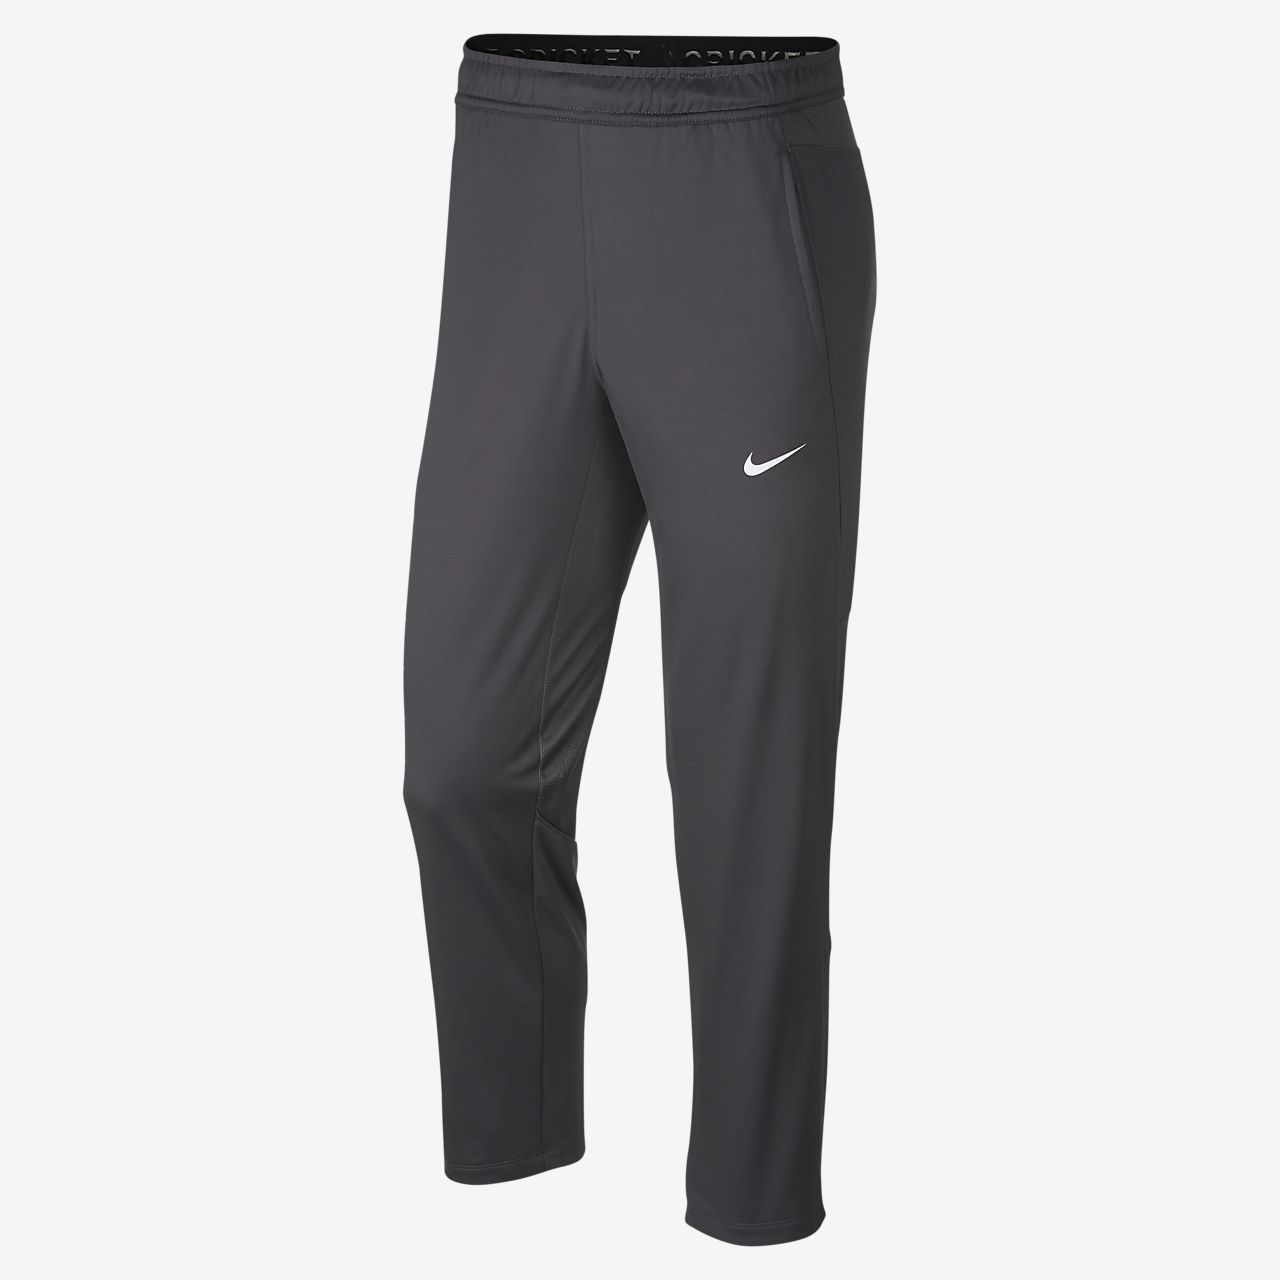 Nike Dri-FIT Men's Cricket Trousers